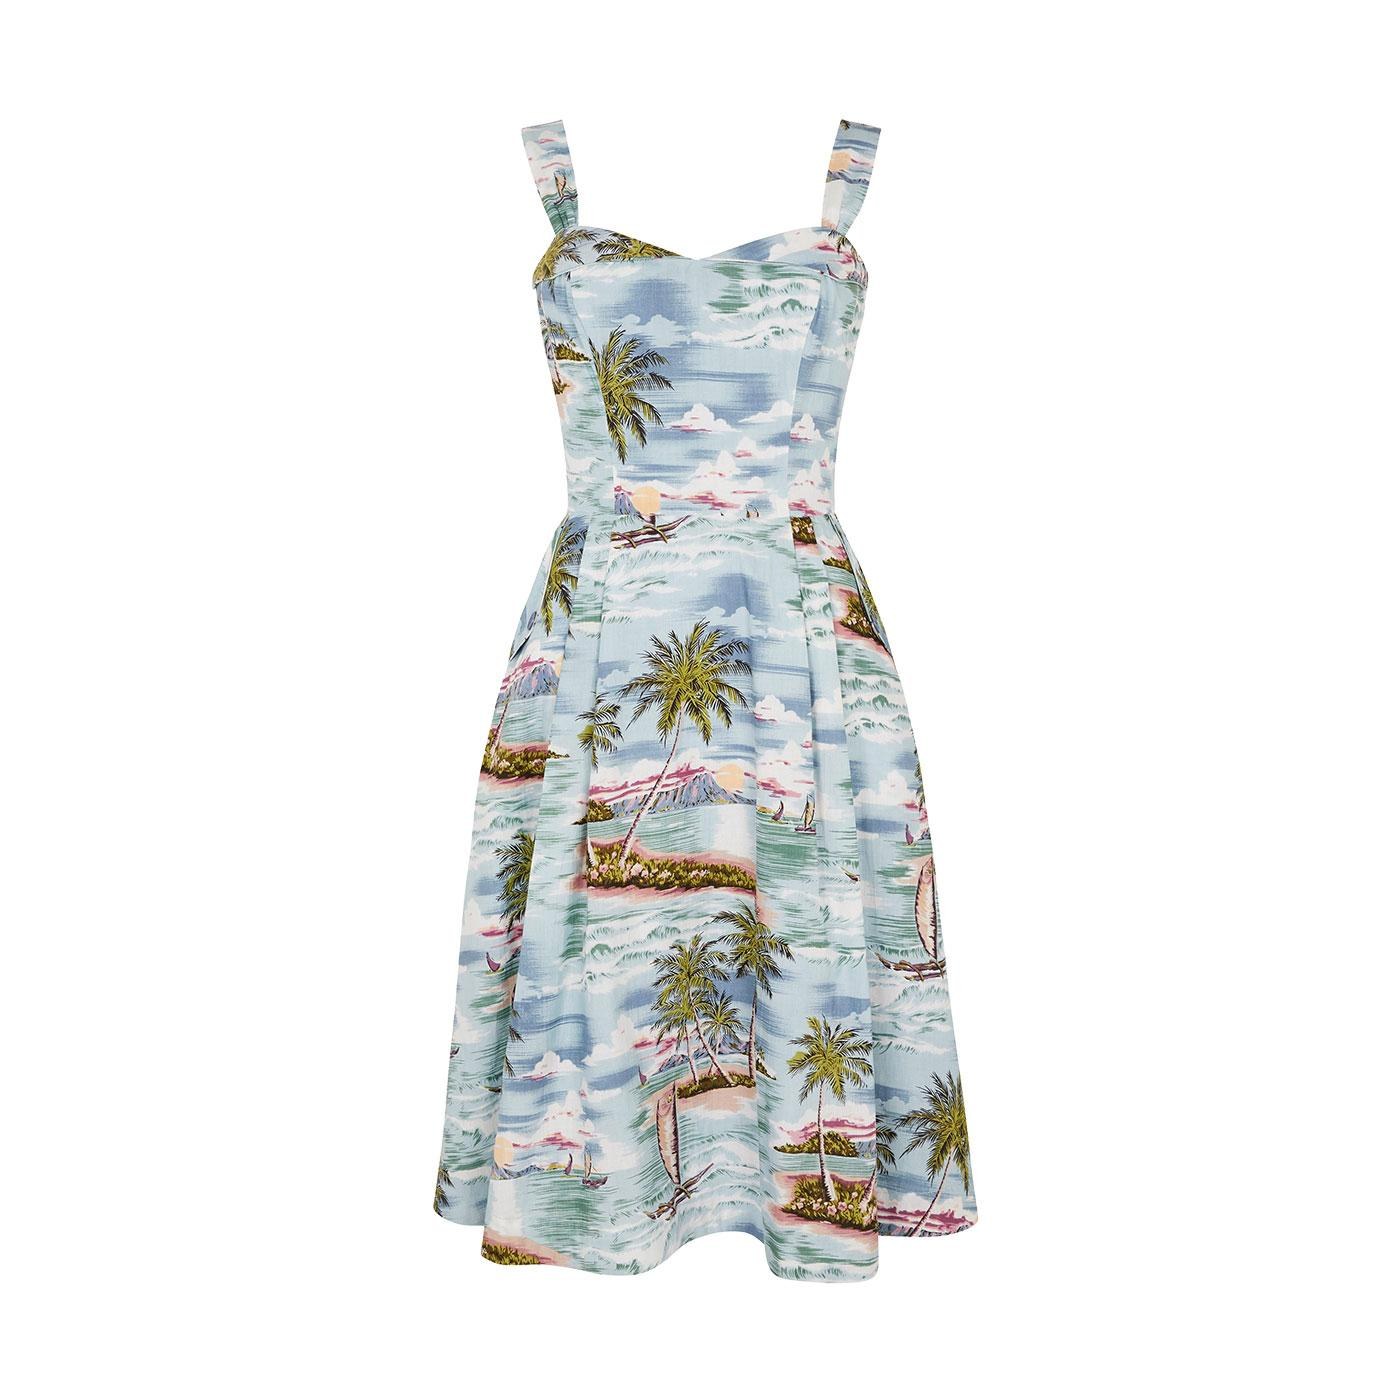 Pippa EMILY & FIN Pacific Island Paradise Dress